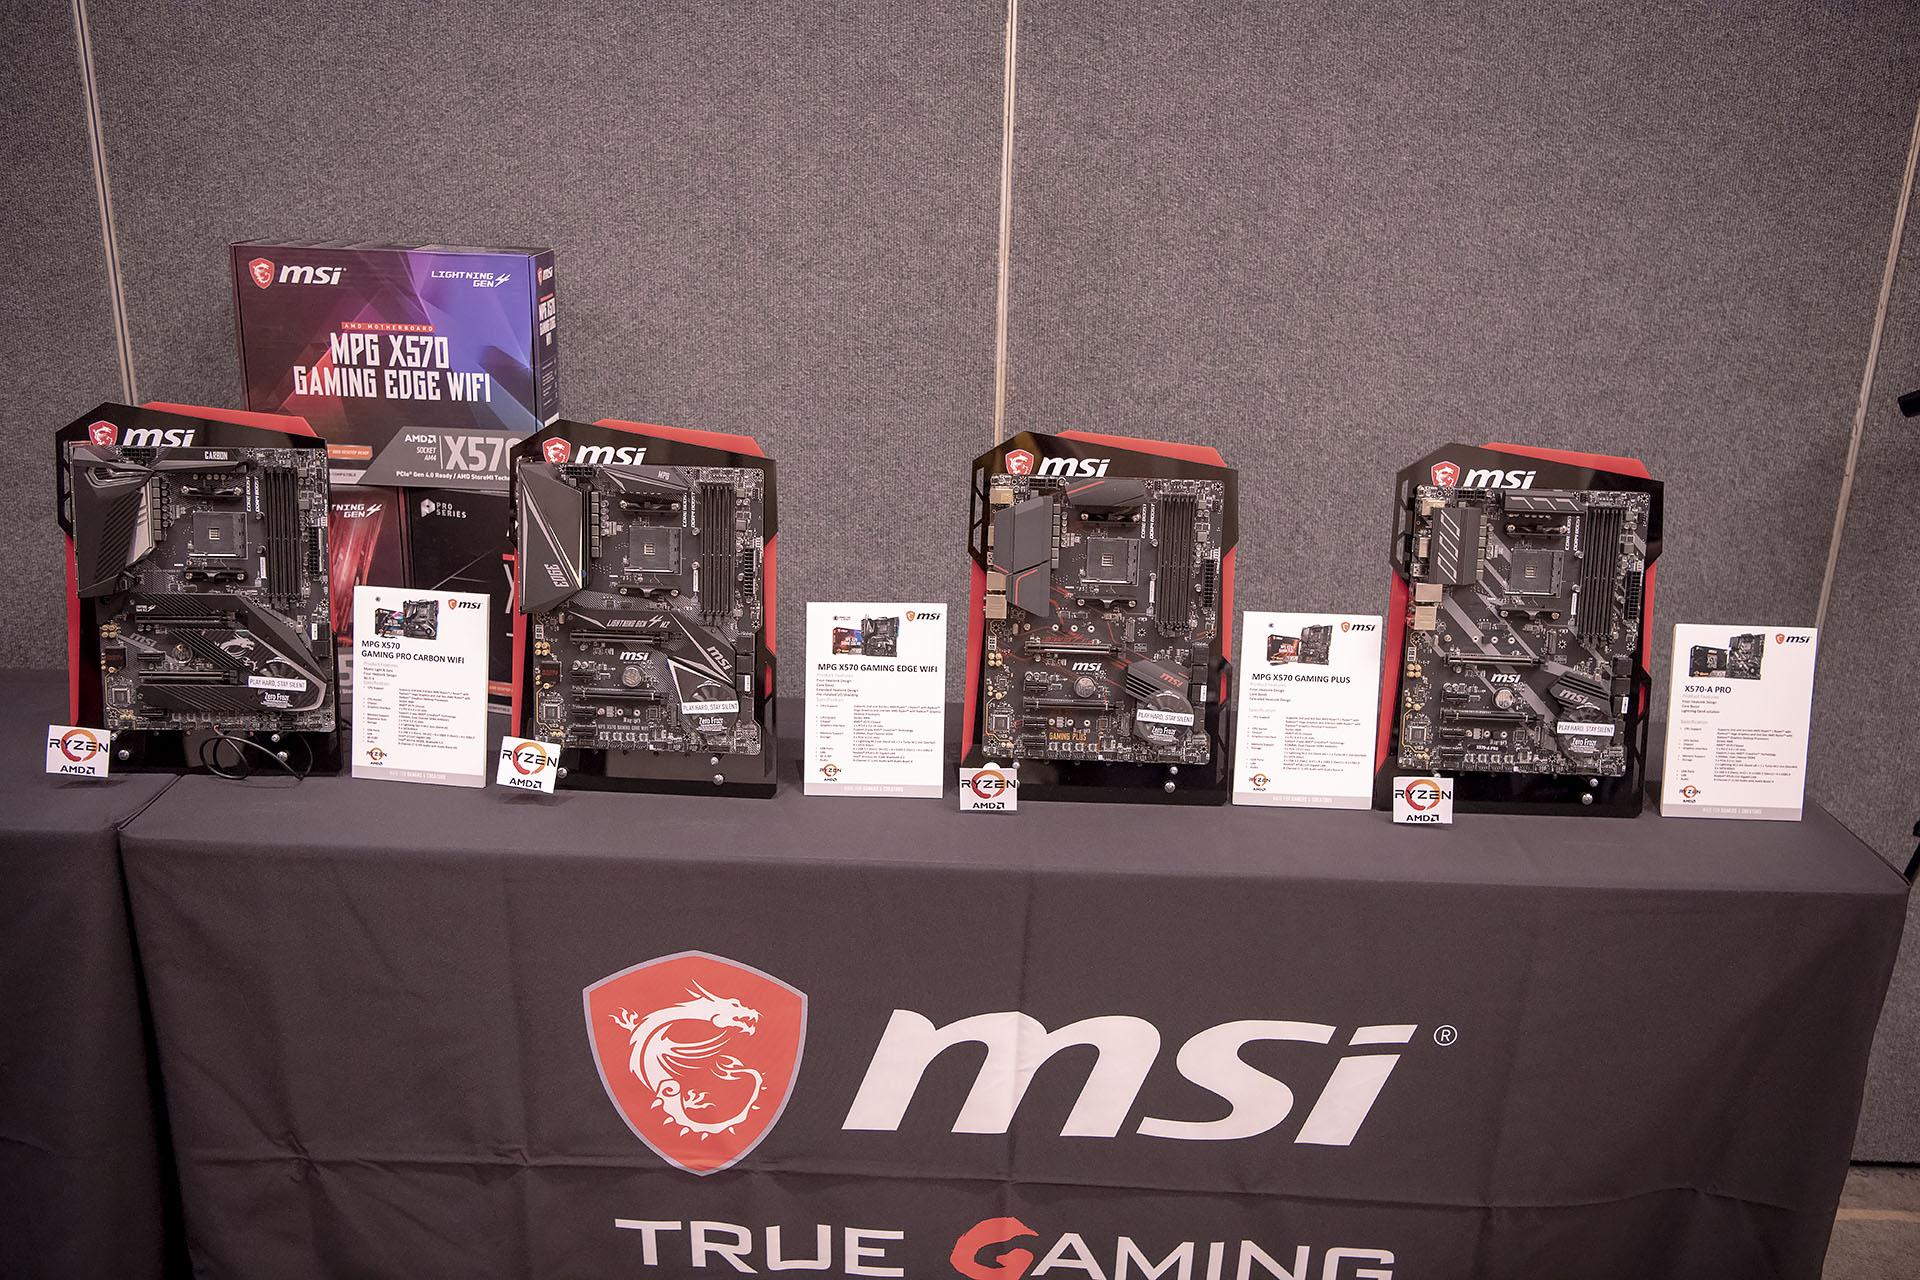 dsc 4820 บรรยากาศงาน MSI Indo Pacific X570 Partner Convention พบการเปิดตัวเมนบอร์ด X570 รุ่นใหม่ล่าสุดจากทาง MSI ต้อนรับการมาของซีพียู AMD RYZEN 3000ซีรี่ย์